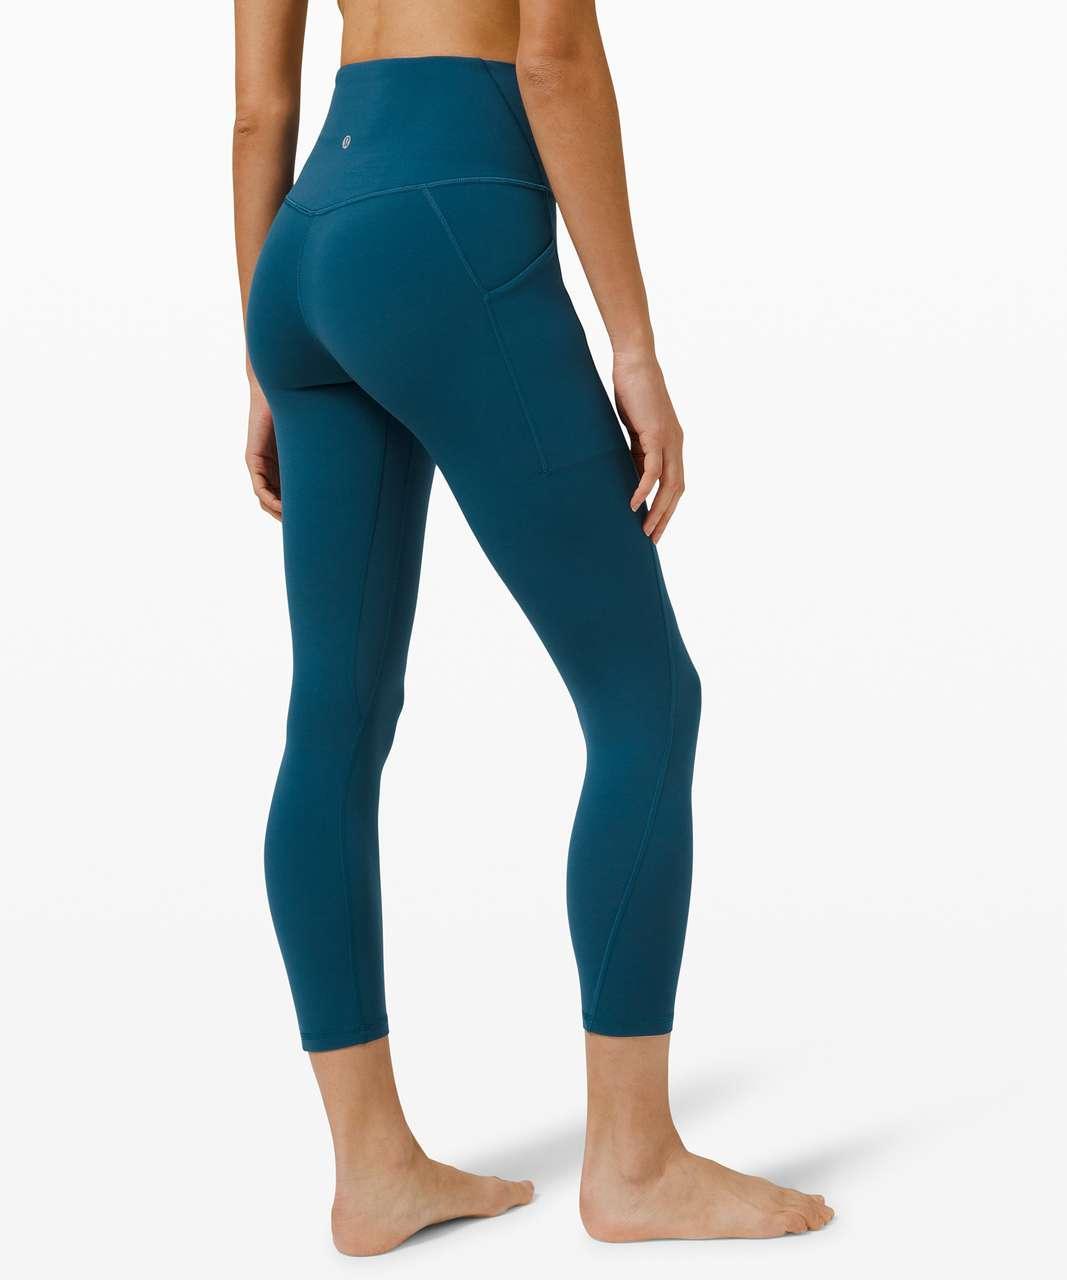 "Lululemon Align High Rise Pant with Pockets 25"" - Blue Borealis"